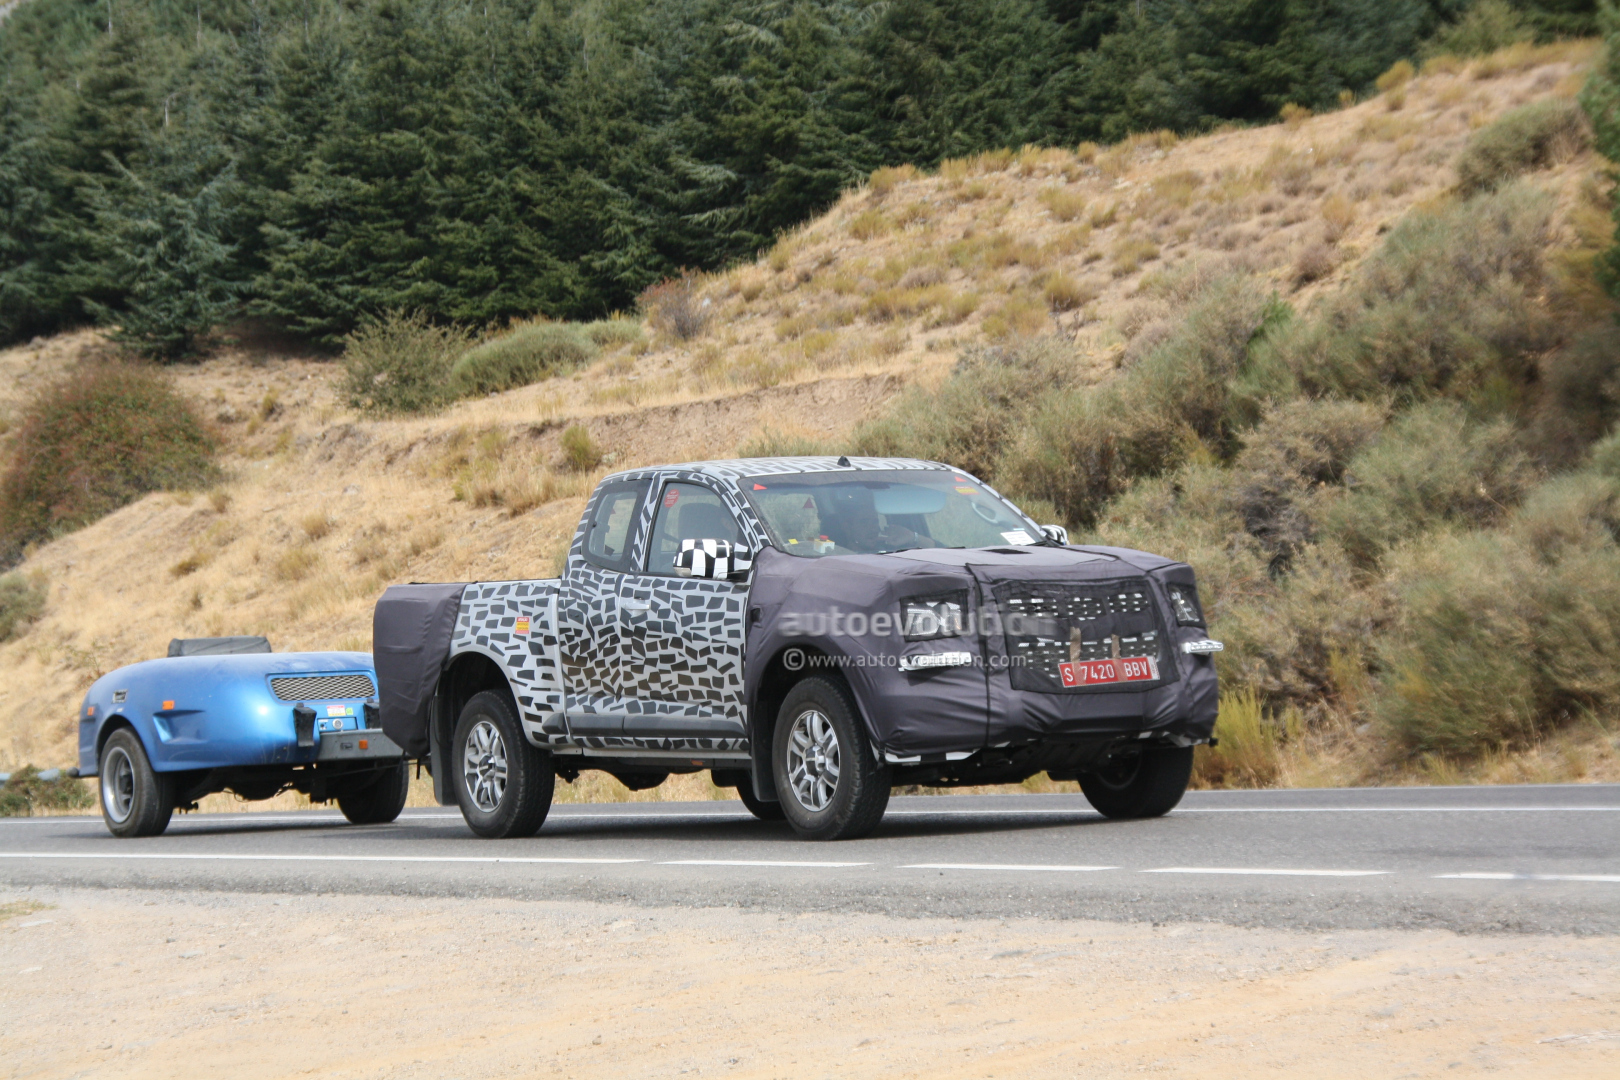 Spyshots 2013 Chevrolet Colorado On European Roads